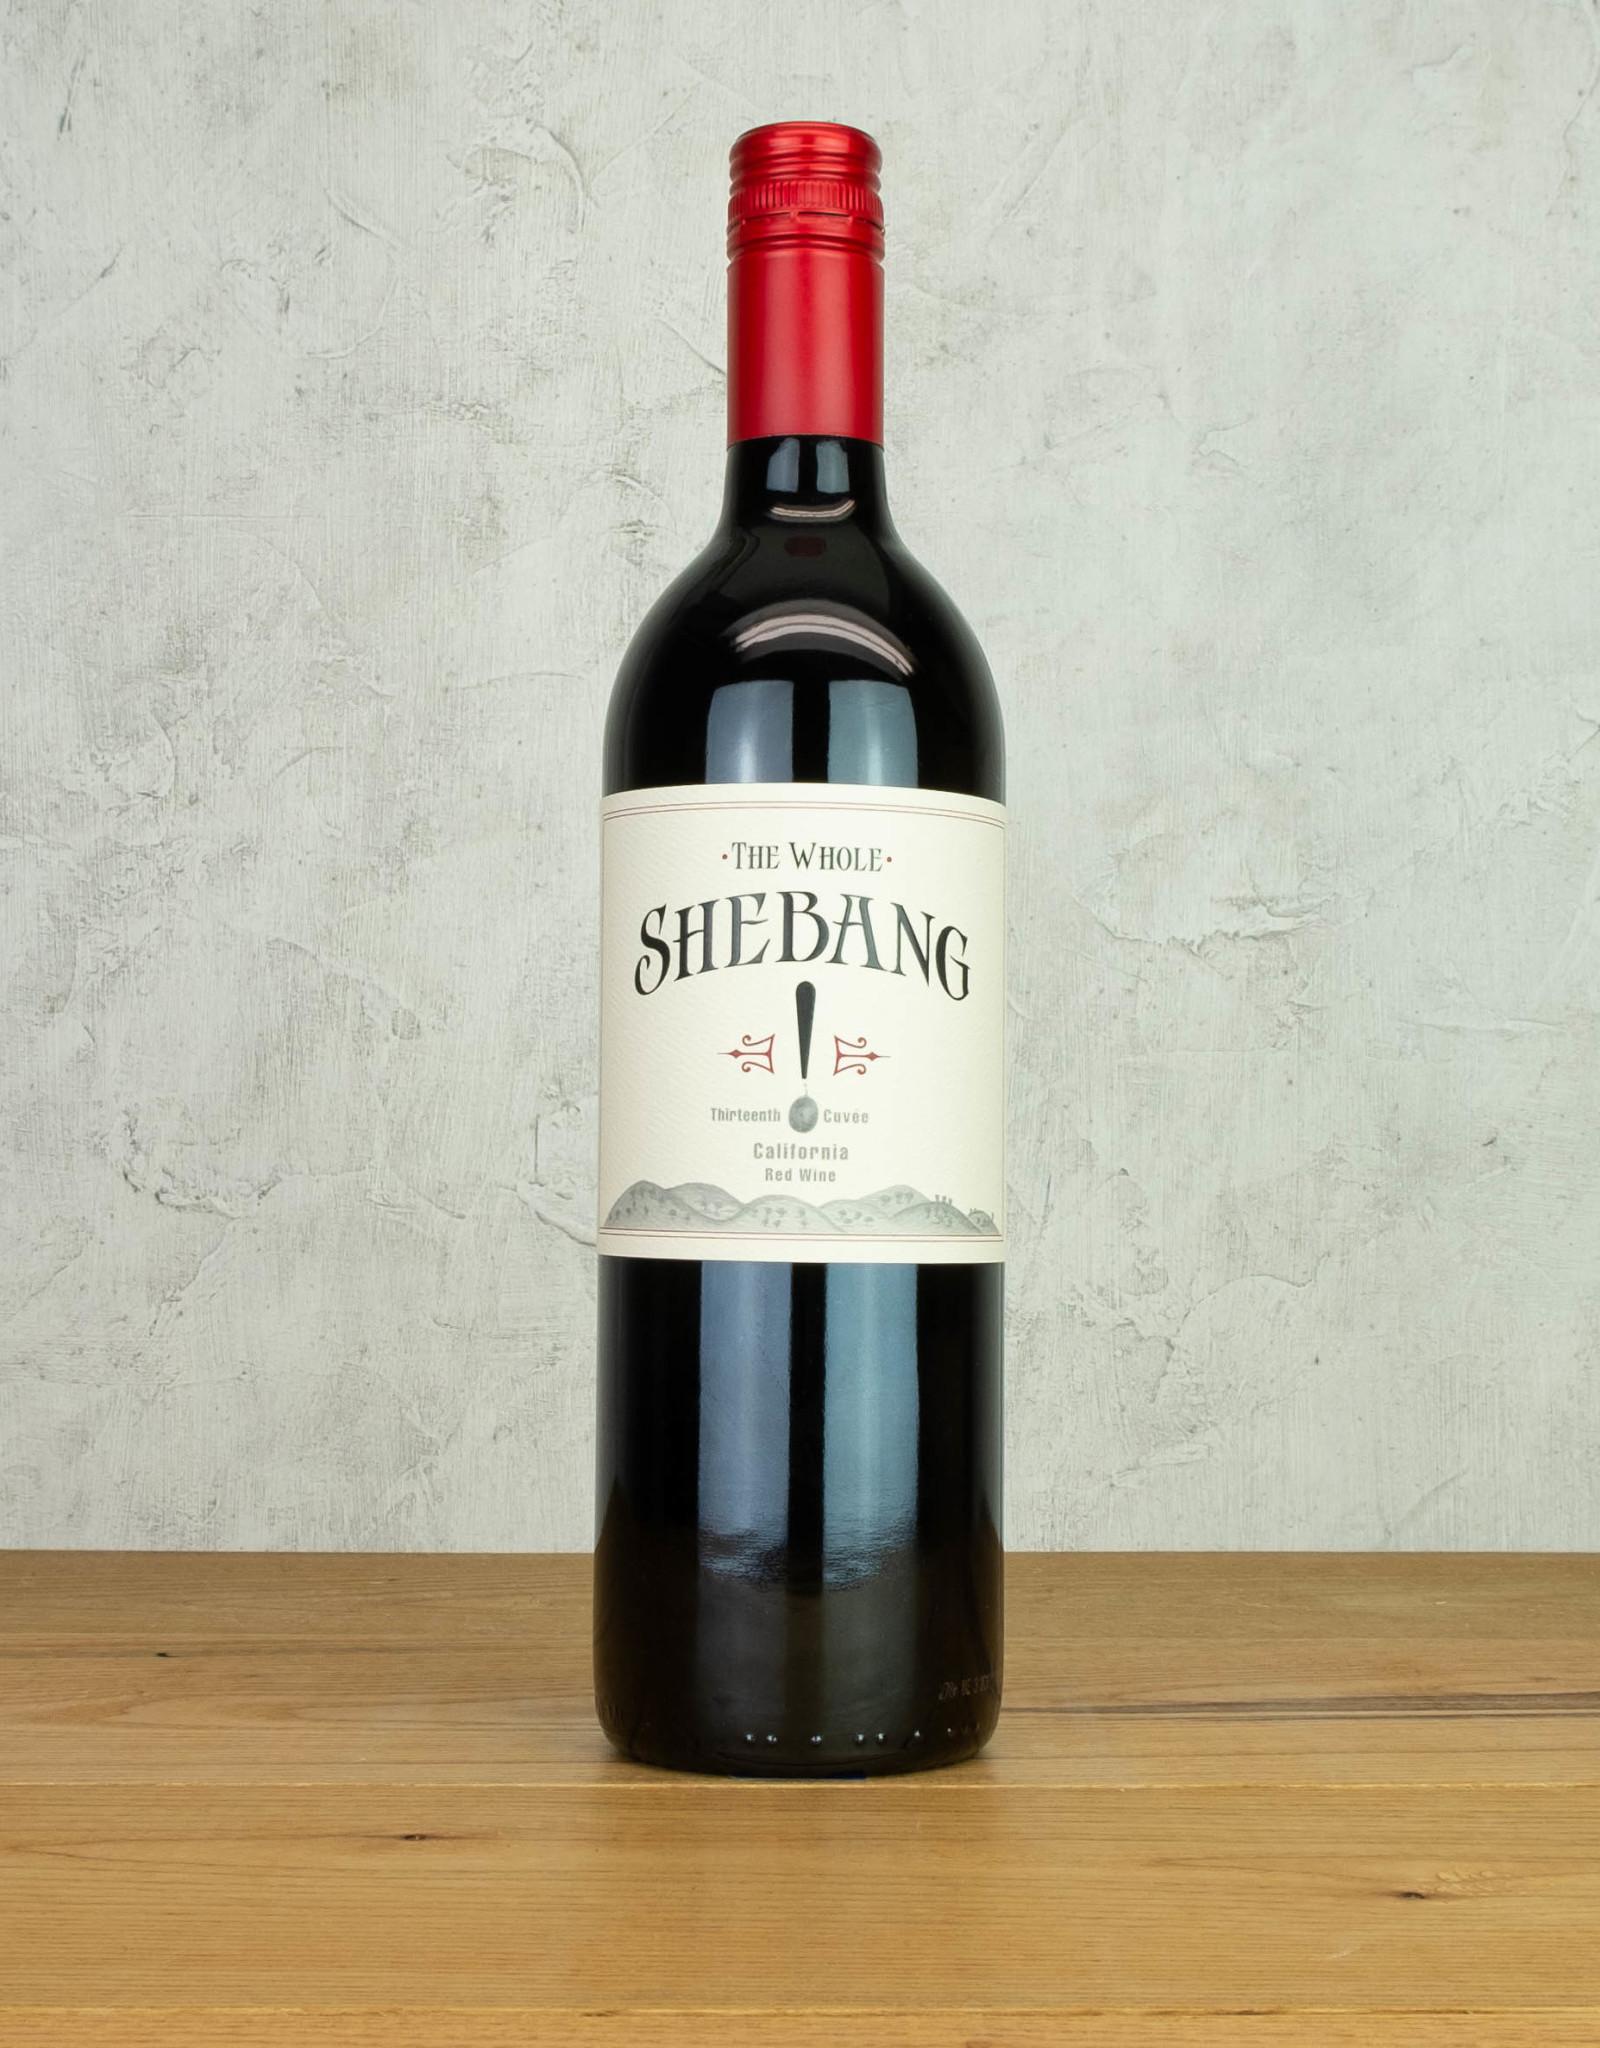 Bedrock Wine Co. The Whole Shebang